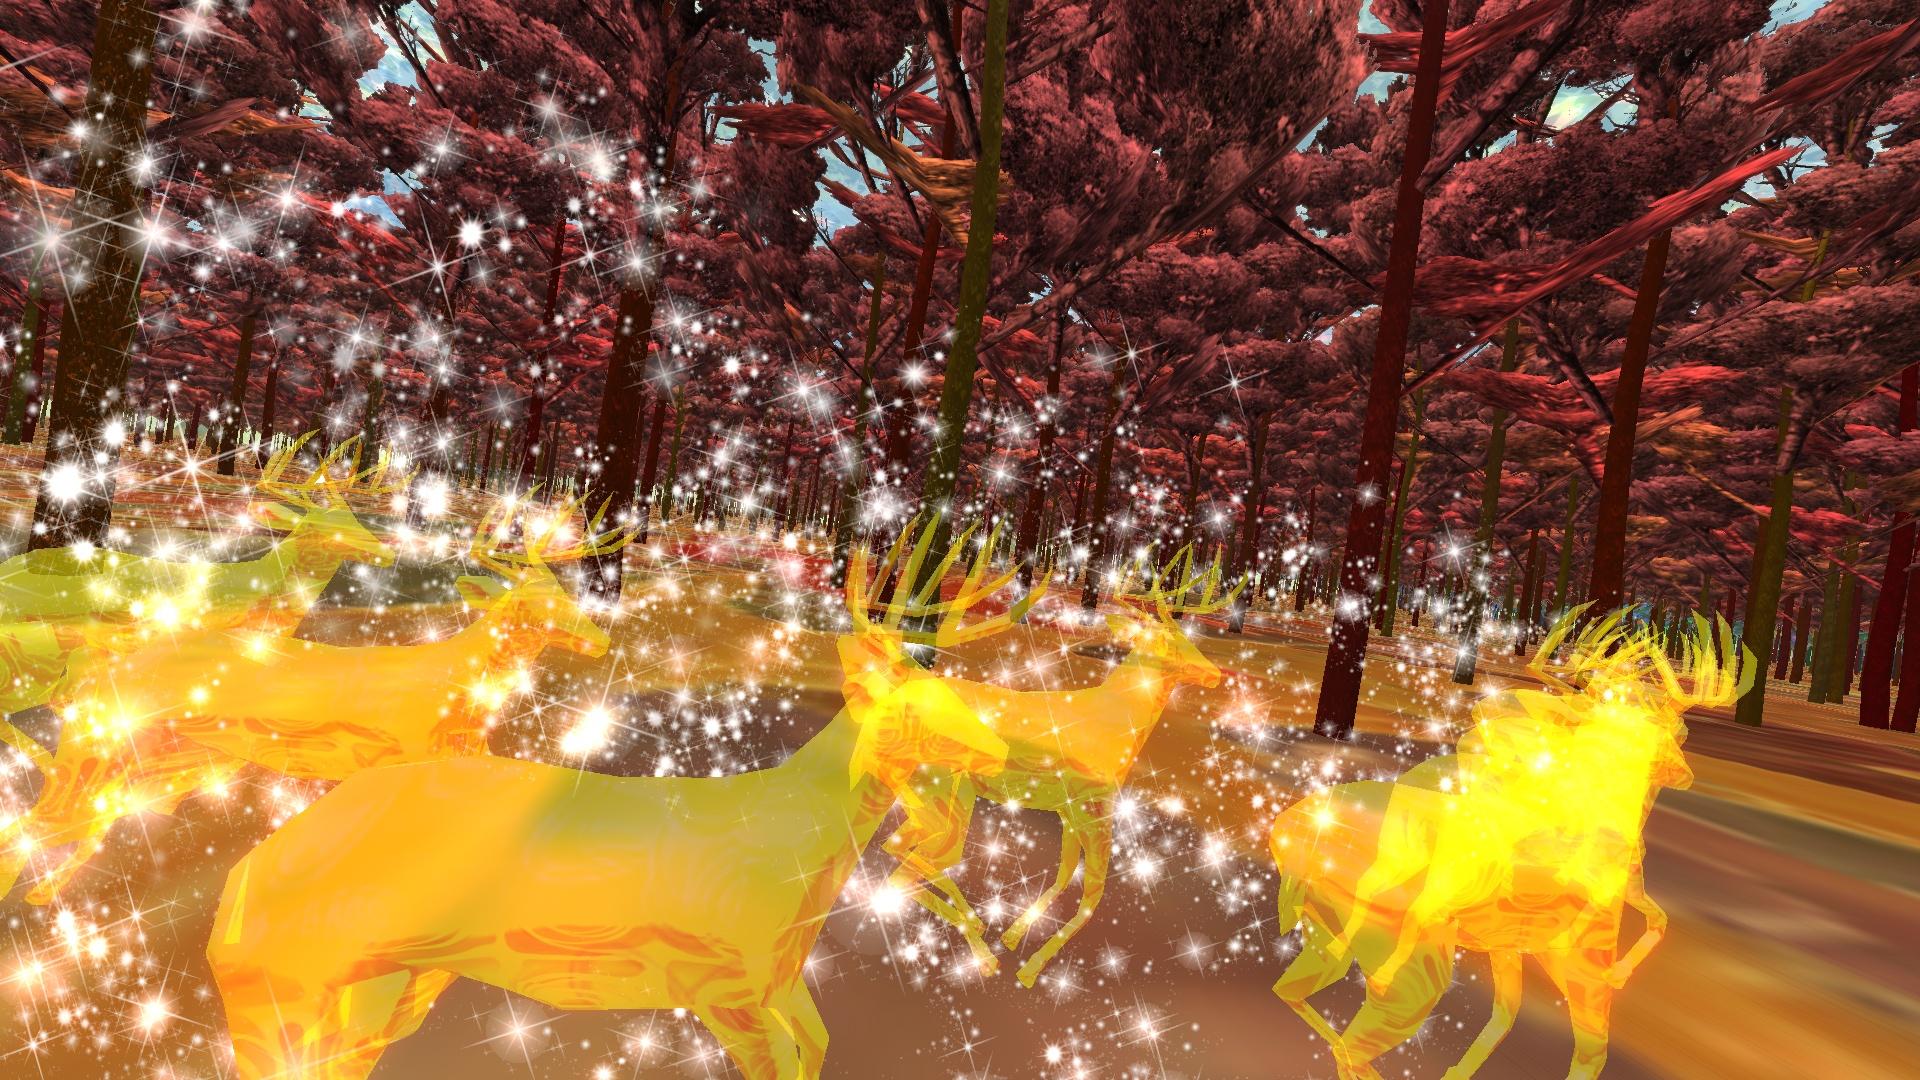 2017/11/27 Fantasy World in 360: Harvest Spirits